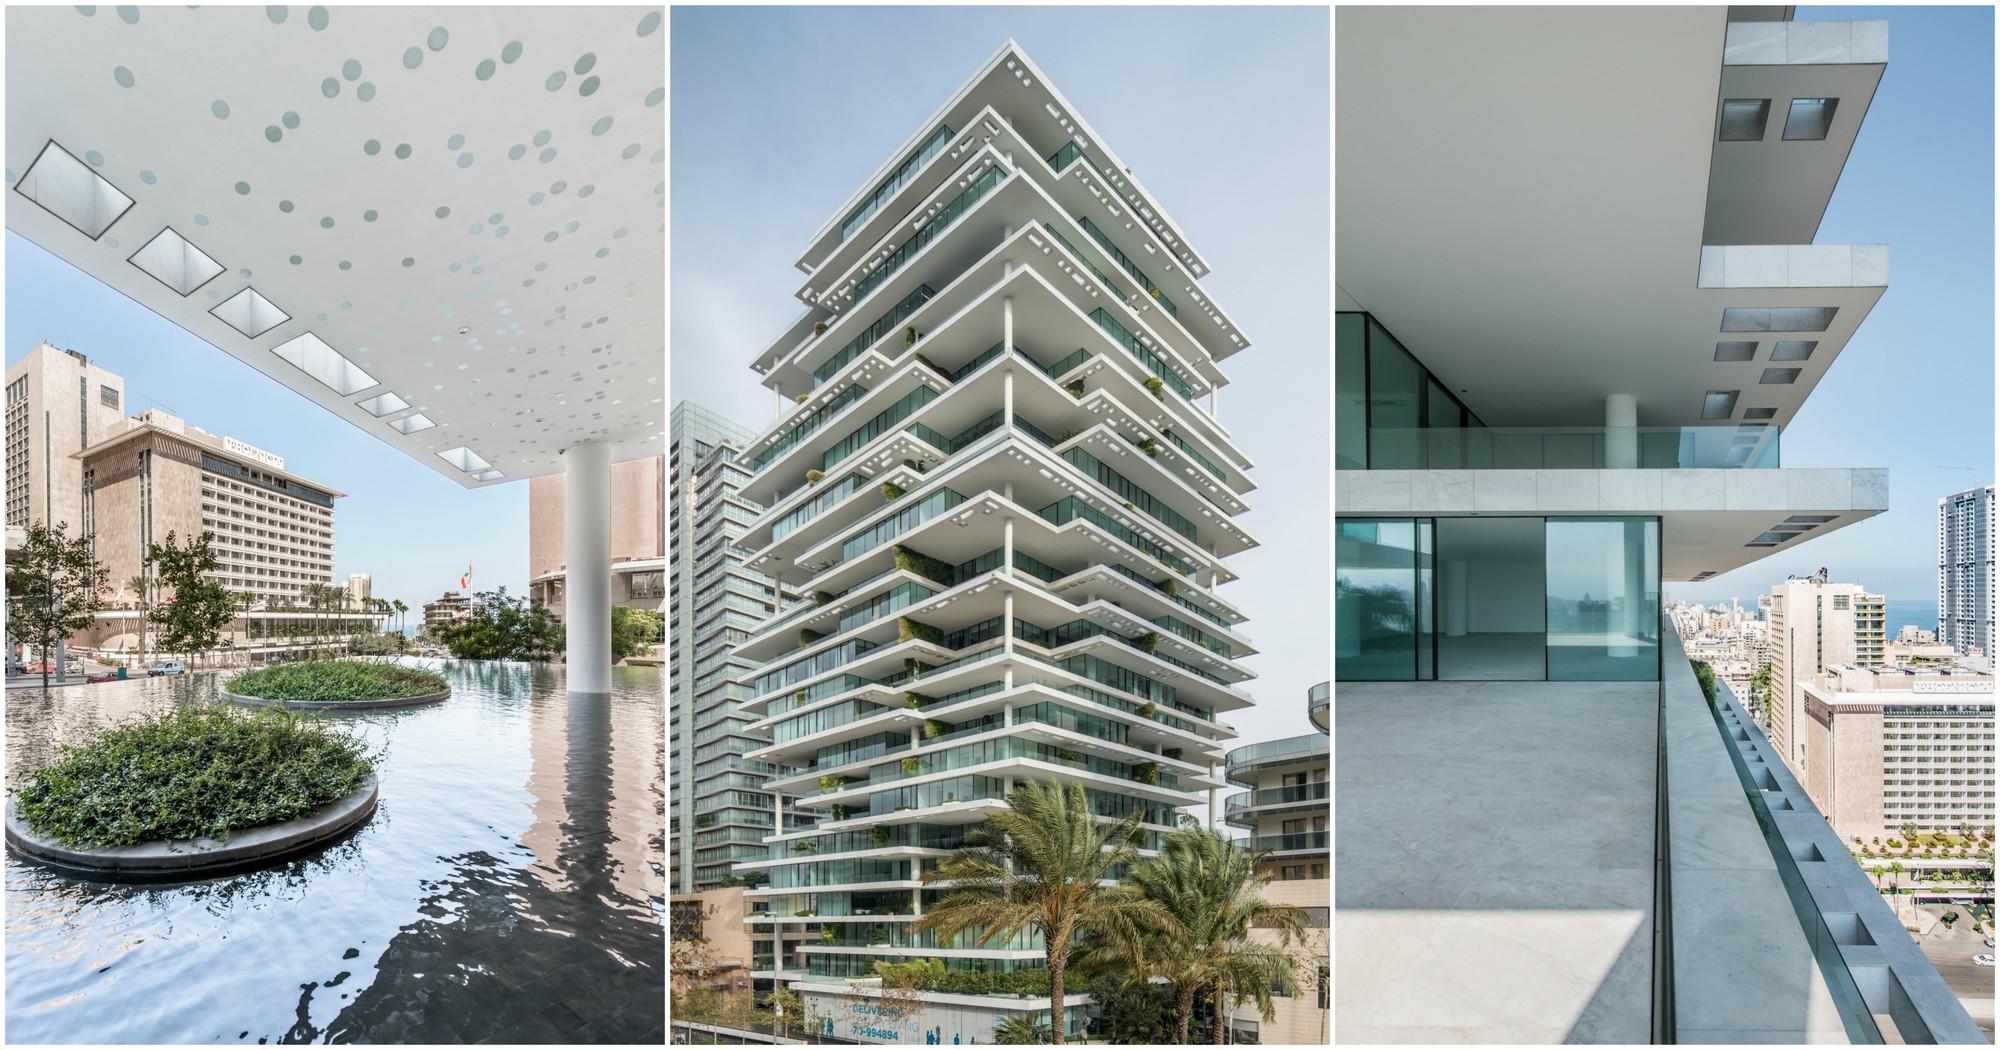 Photos Capture the Luxurious Life Inside Herzog & de Meuron's Beirut Terraces